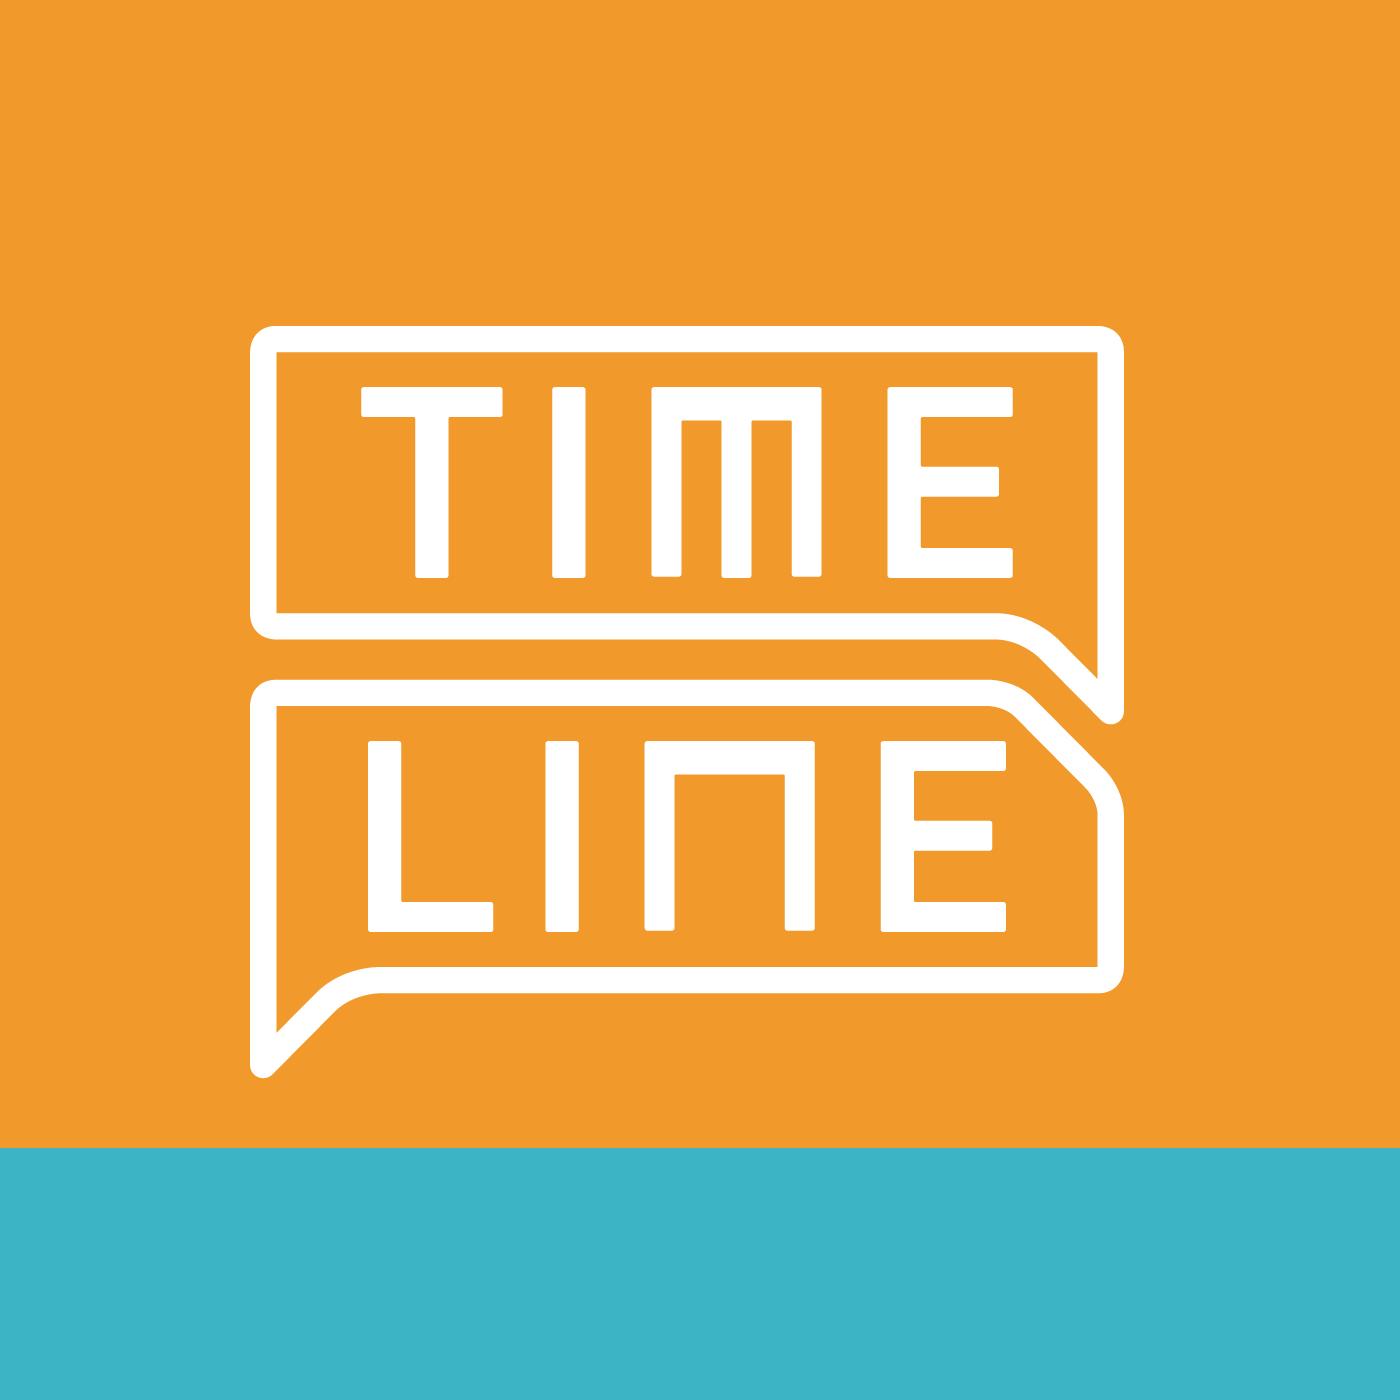 Timeline Ga�cha - 27/07/2016